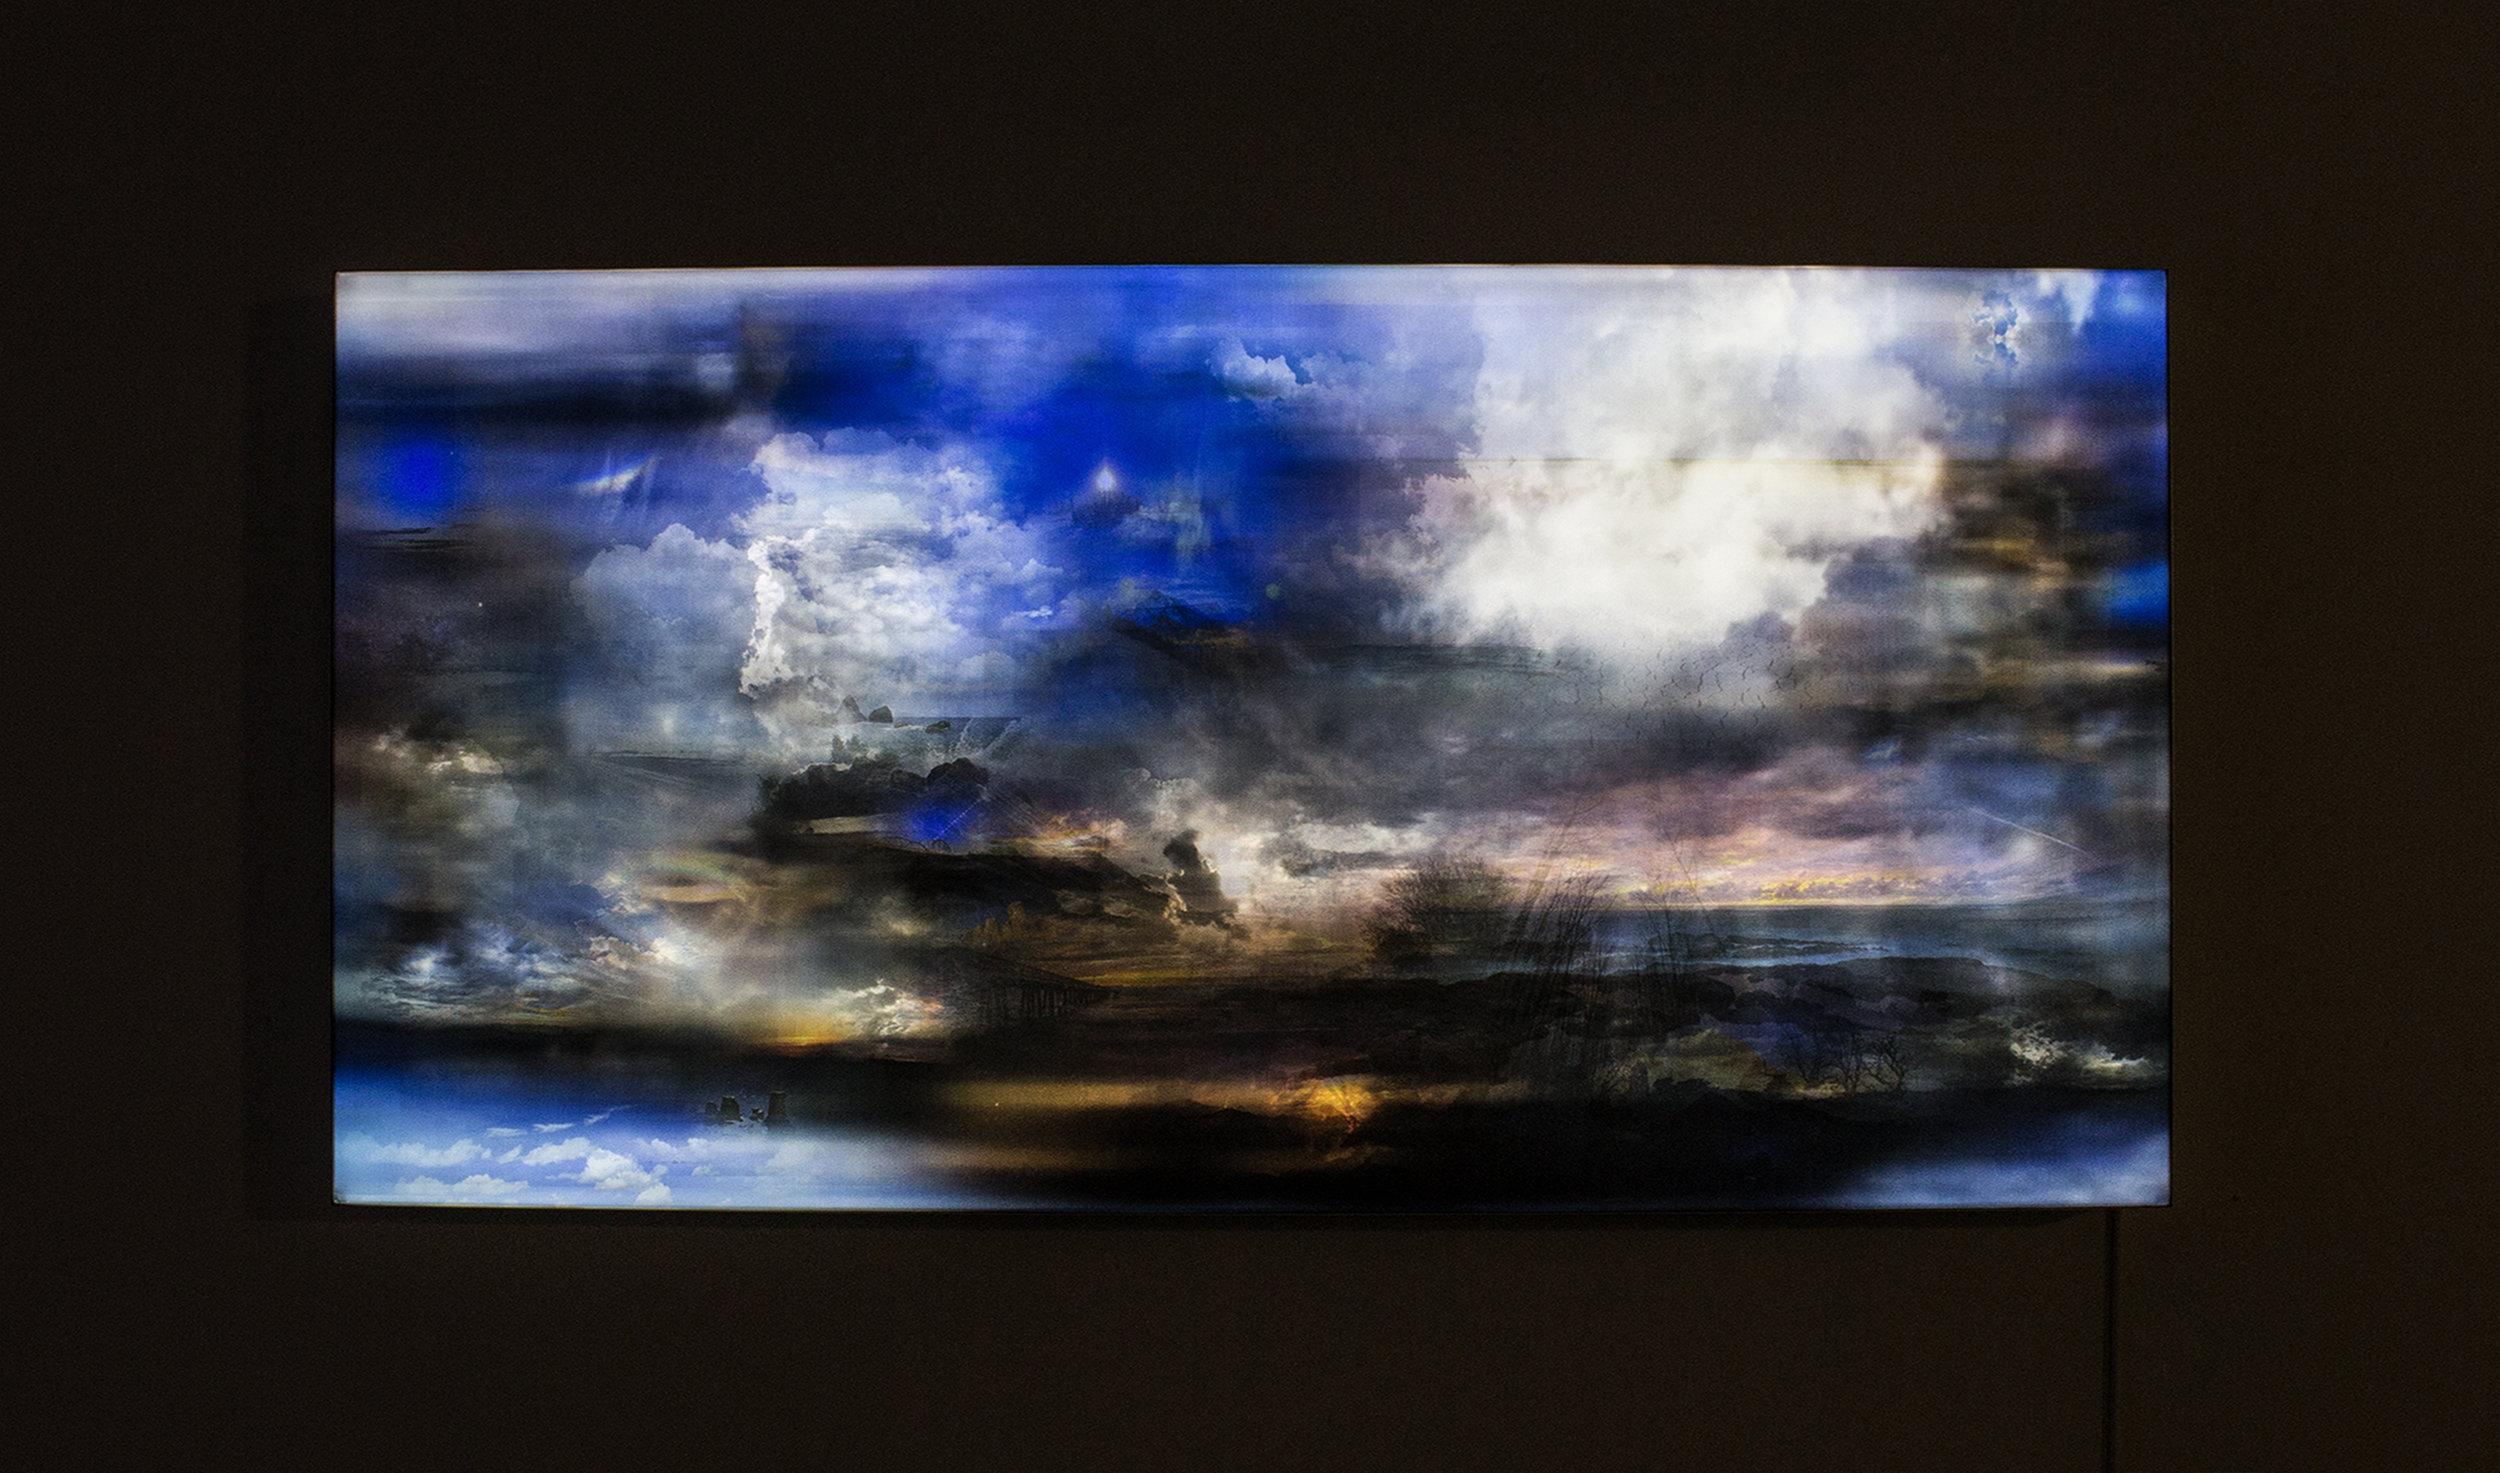 Lost Skies, Air Pollution